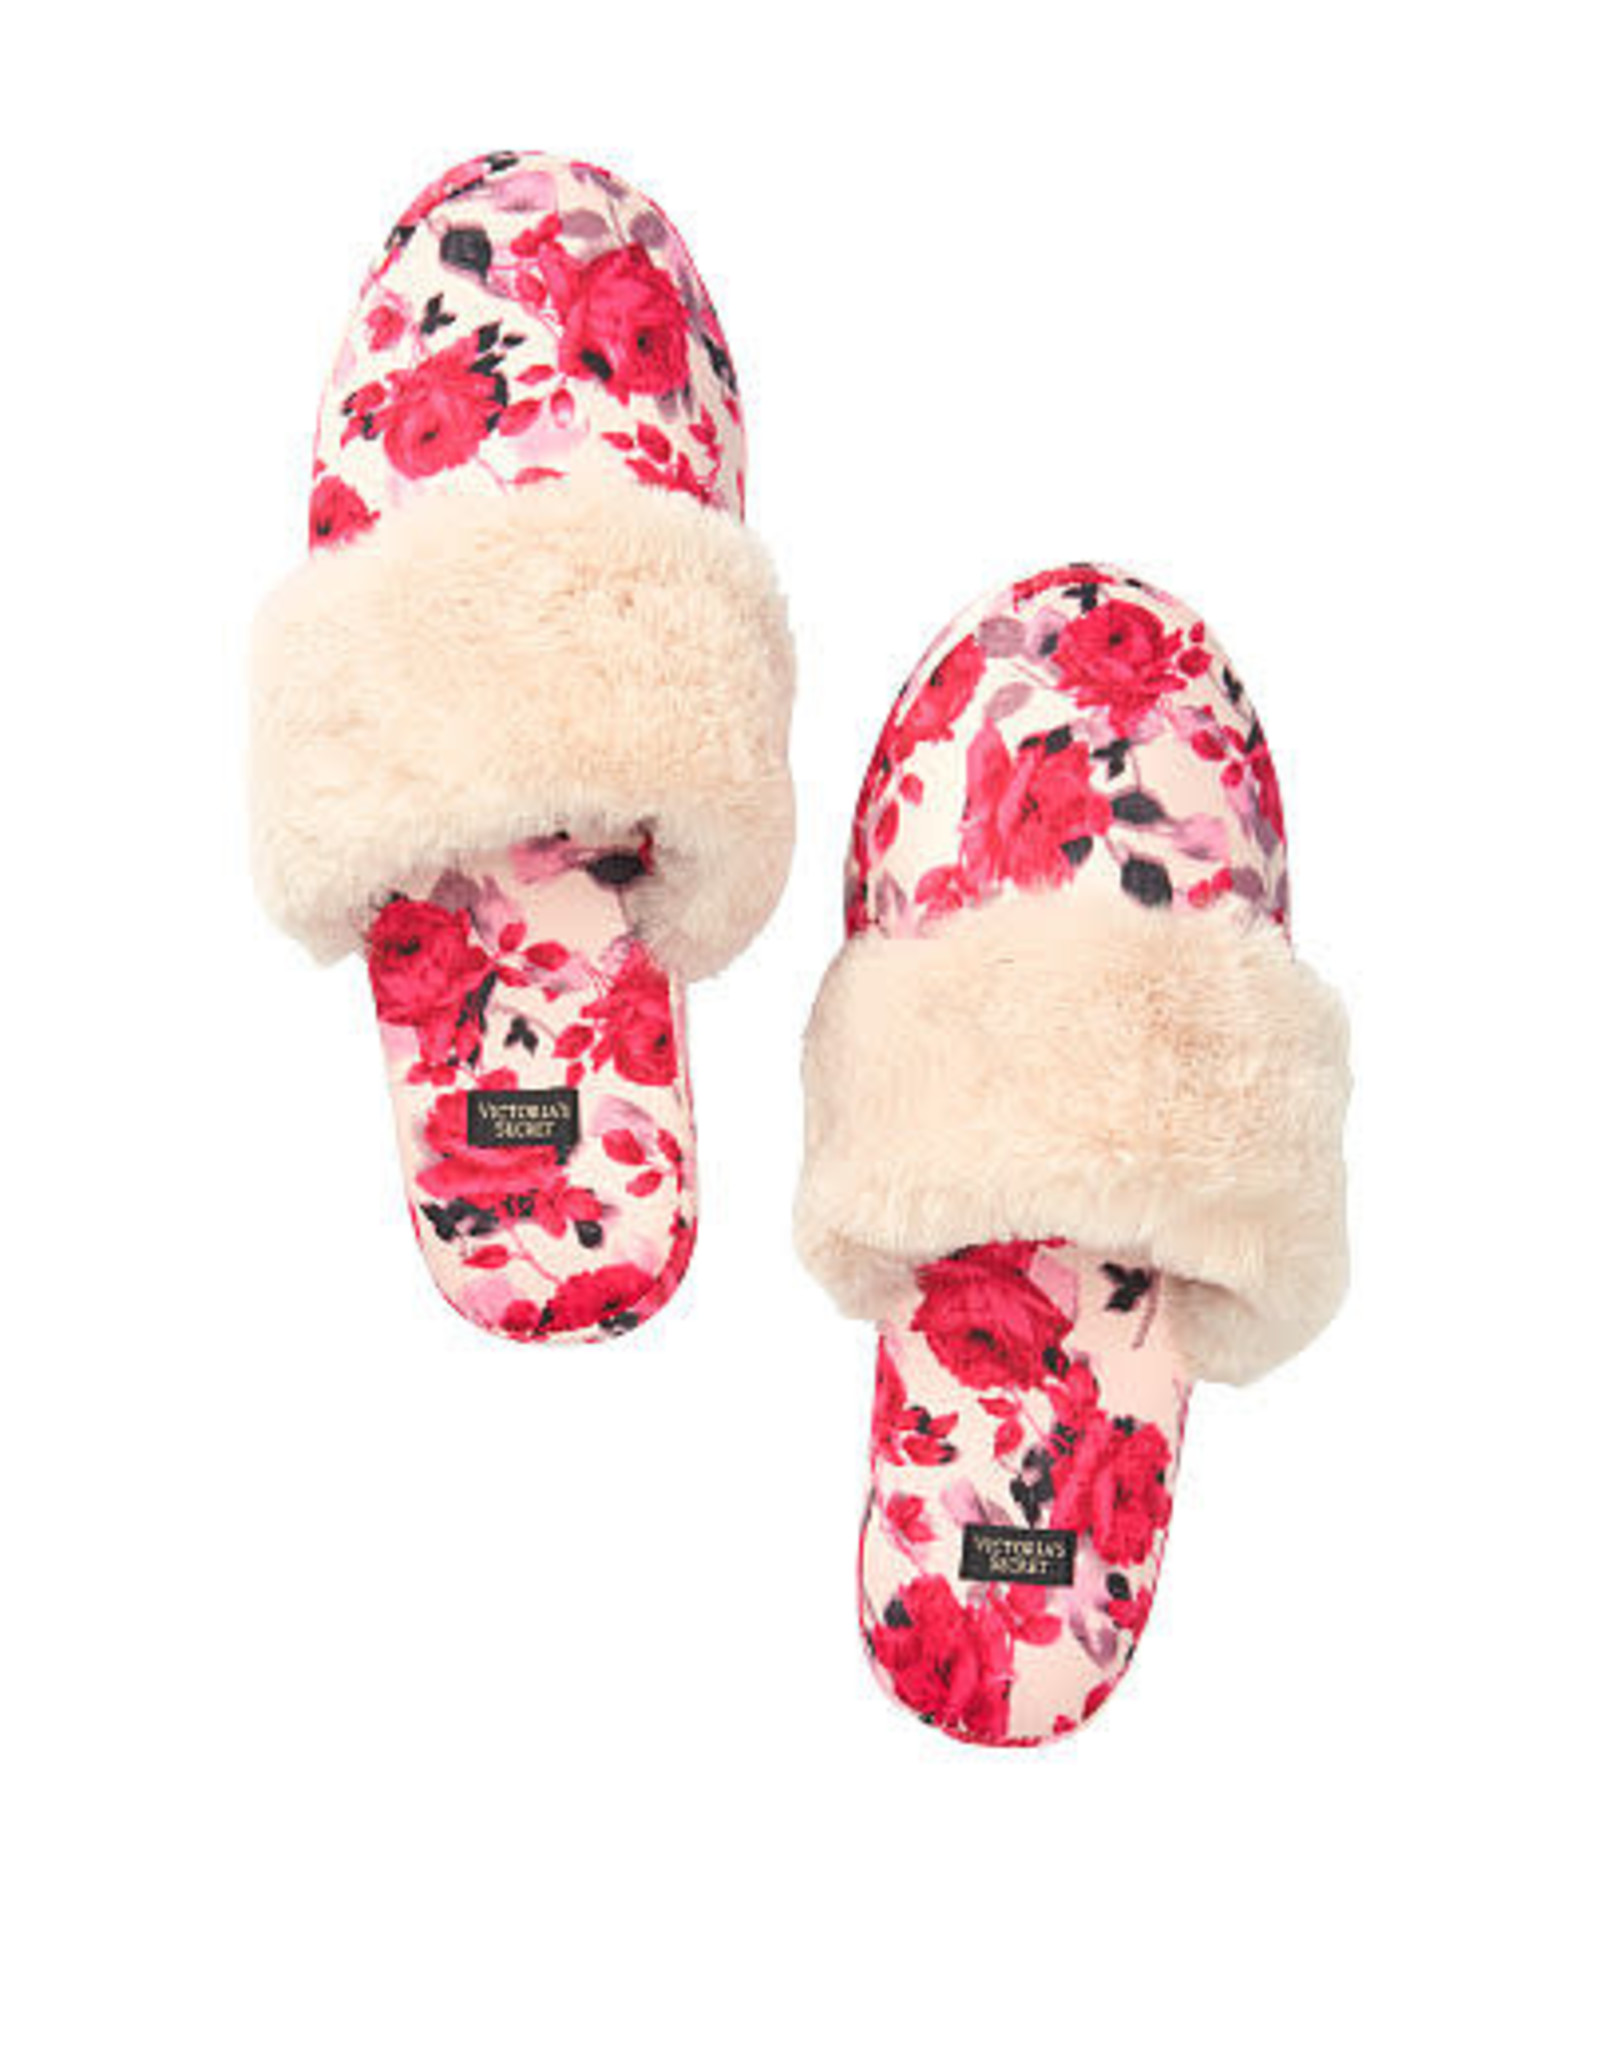 Victoria's Secret Victoria's Secret Signature Satin Slippers